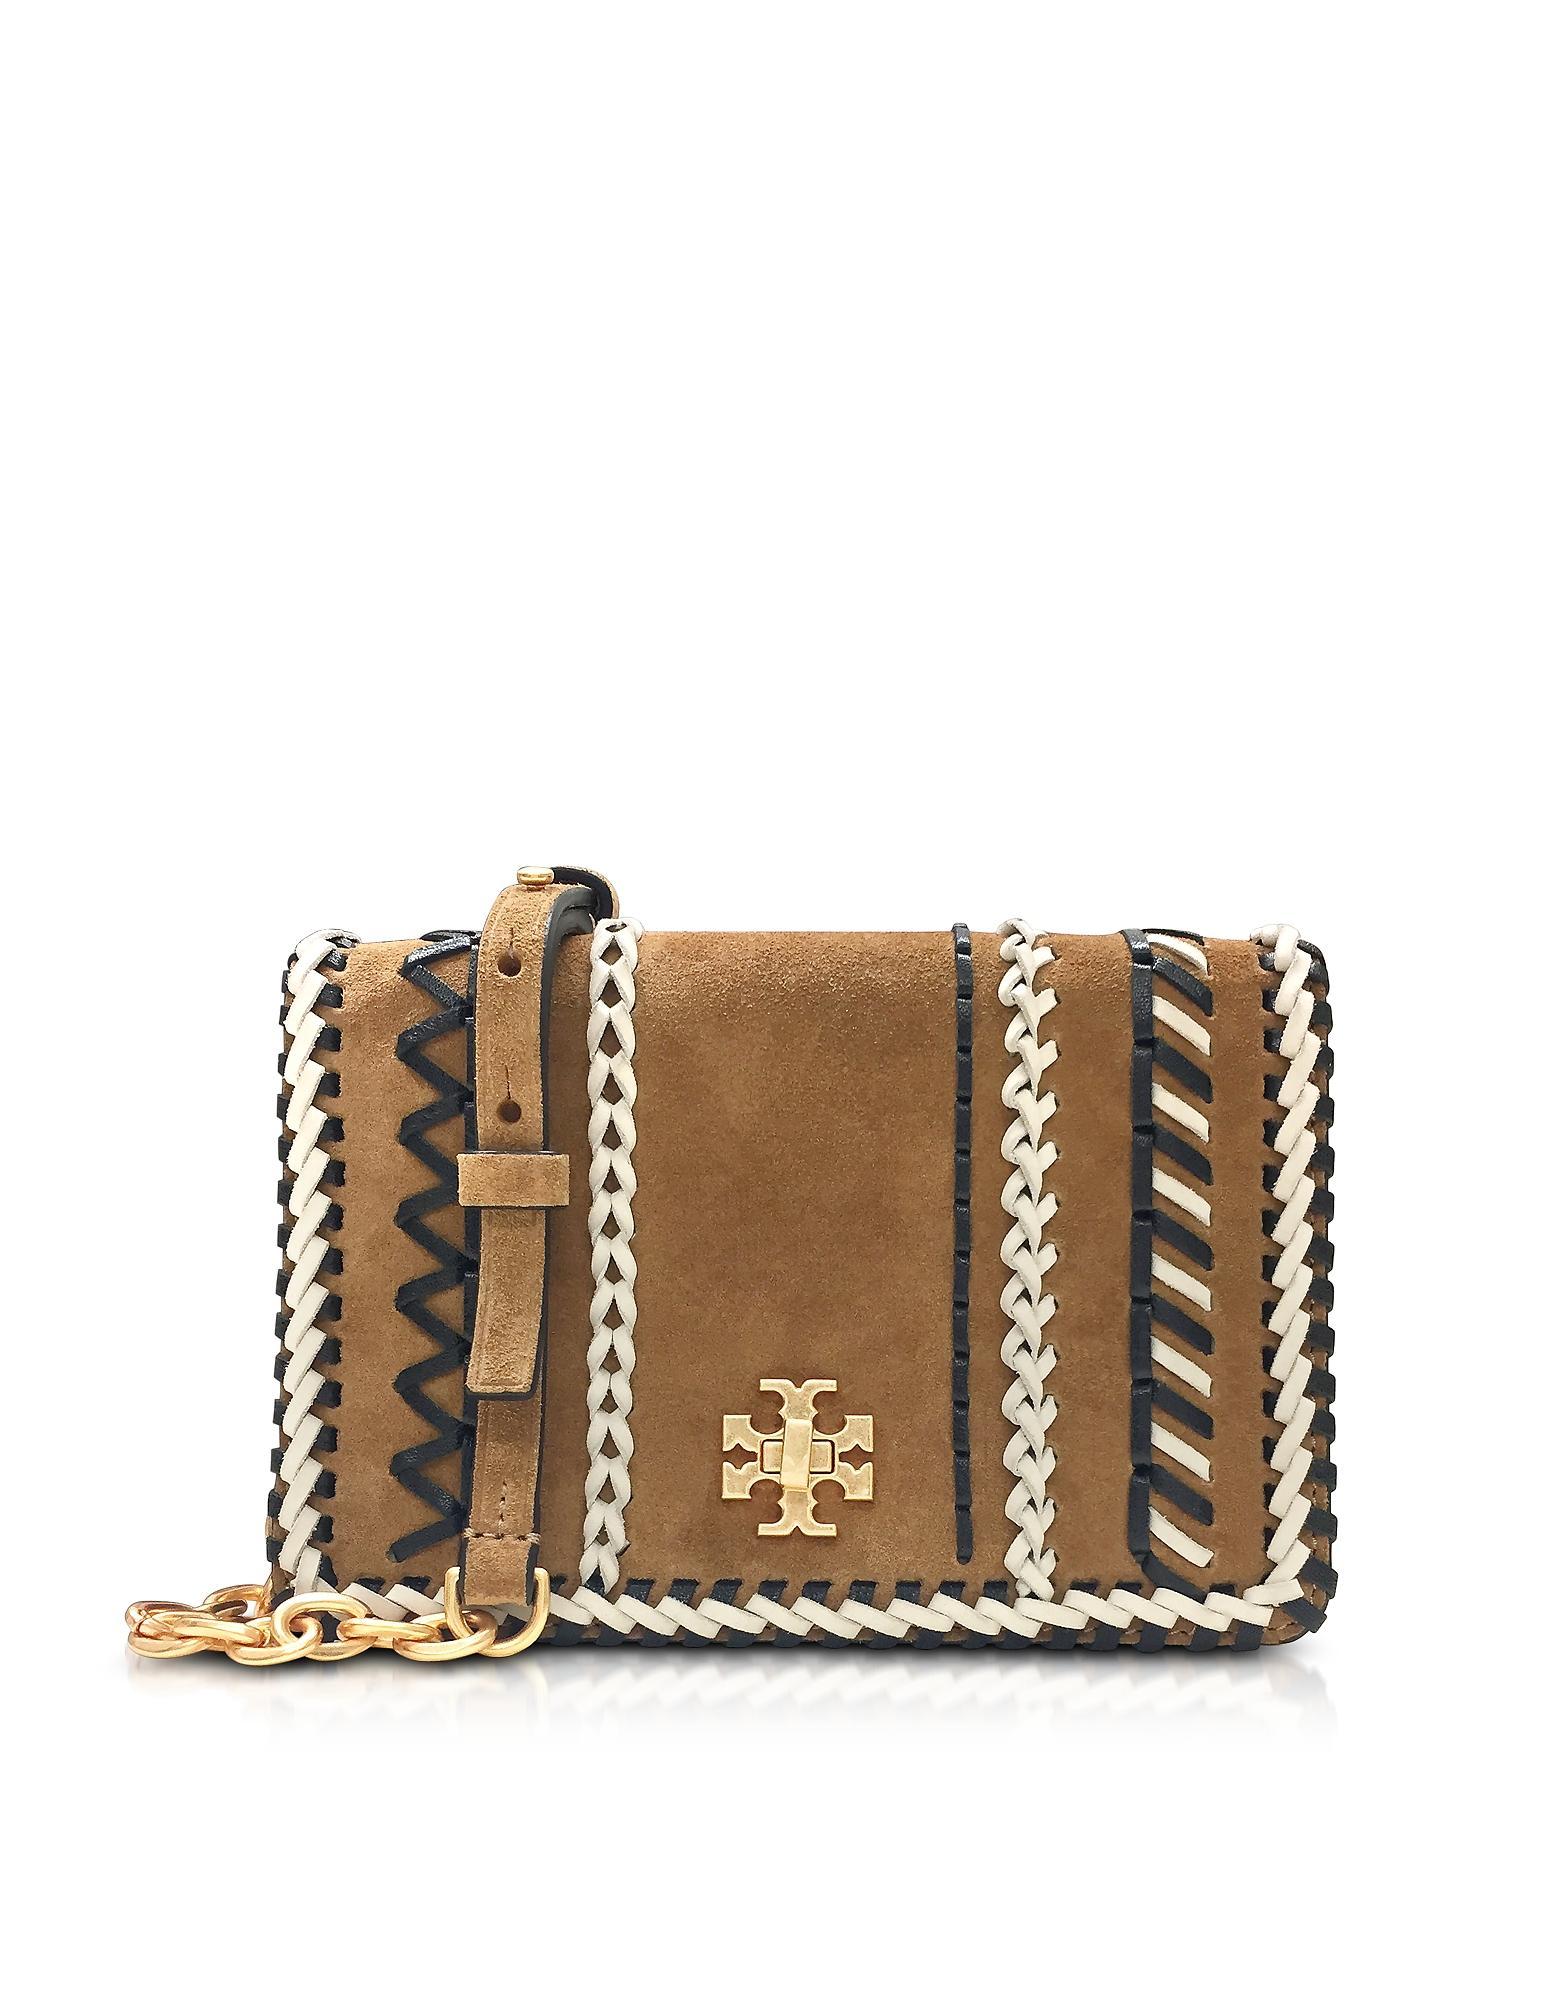 c89aaa1beacd Tory Burch Kira Whipstitch Hazel Suede Mini Crossbody Bag In Brown ...